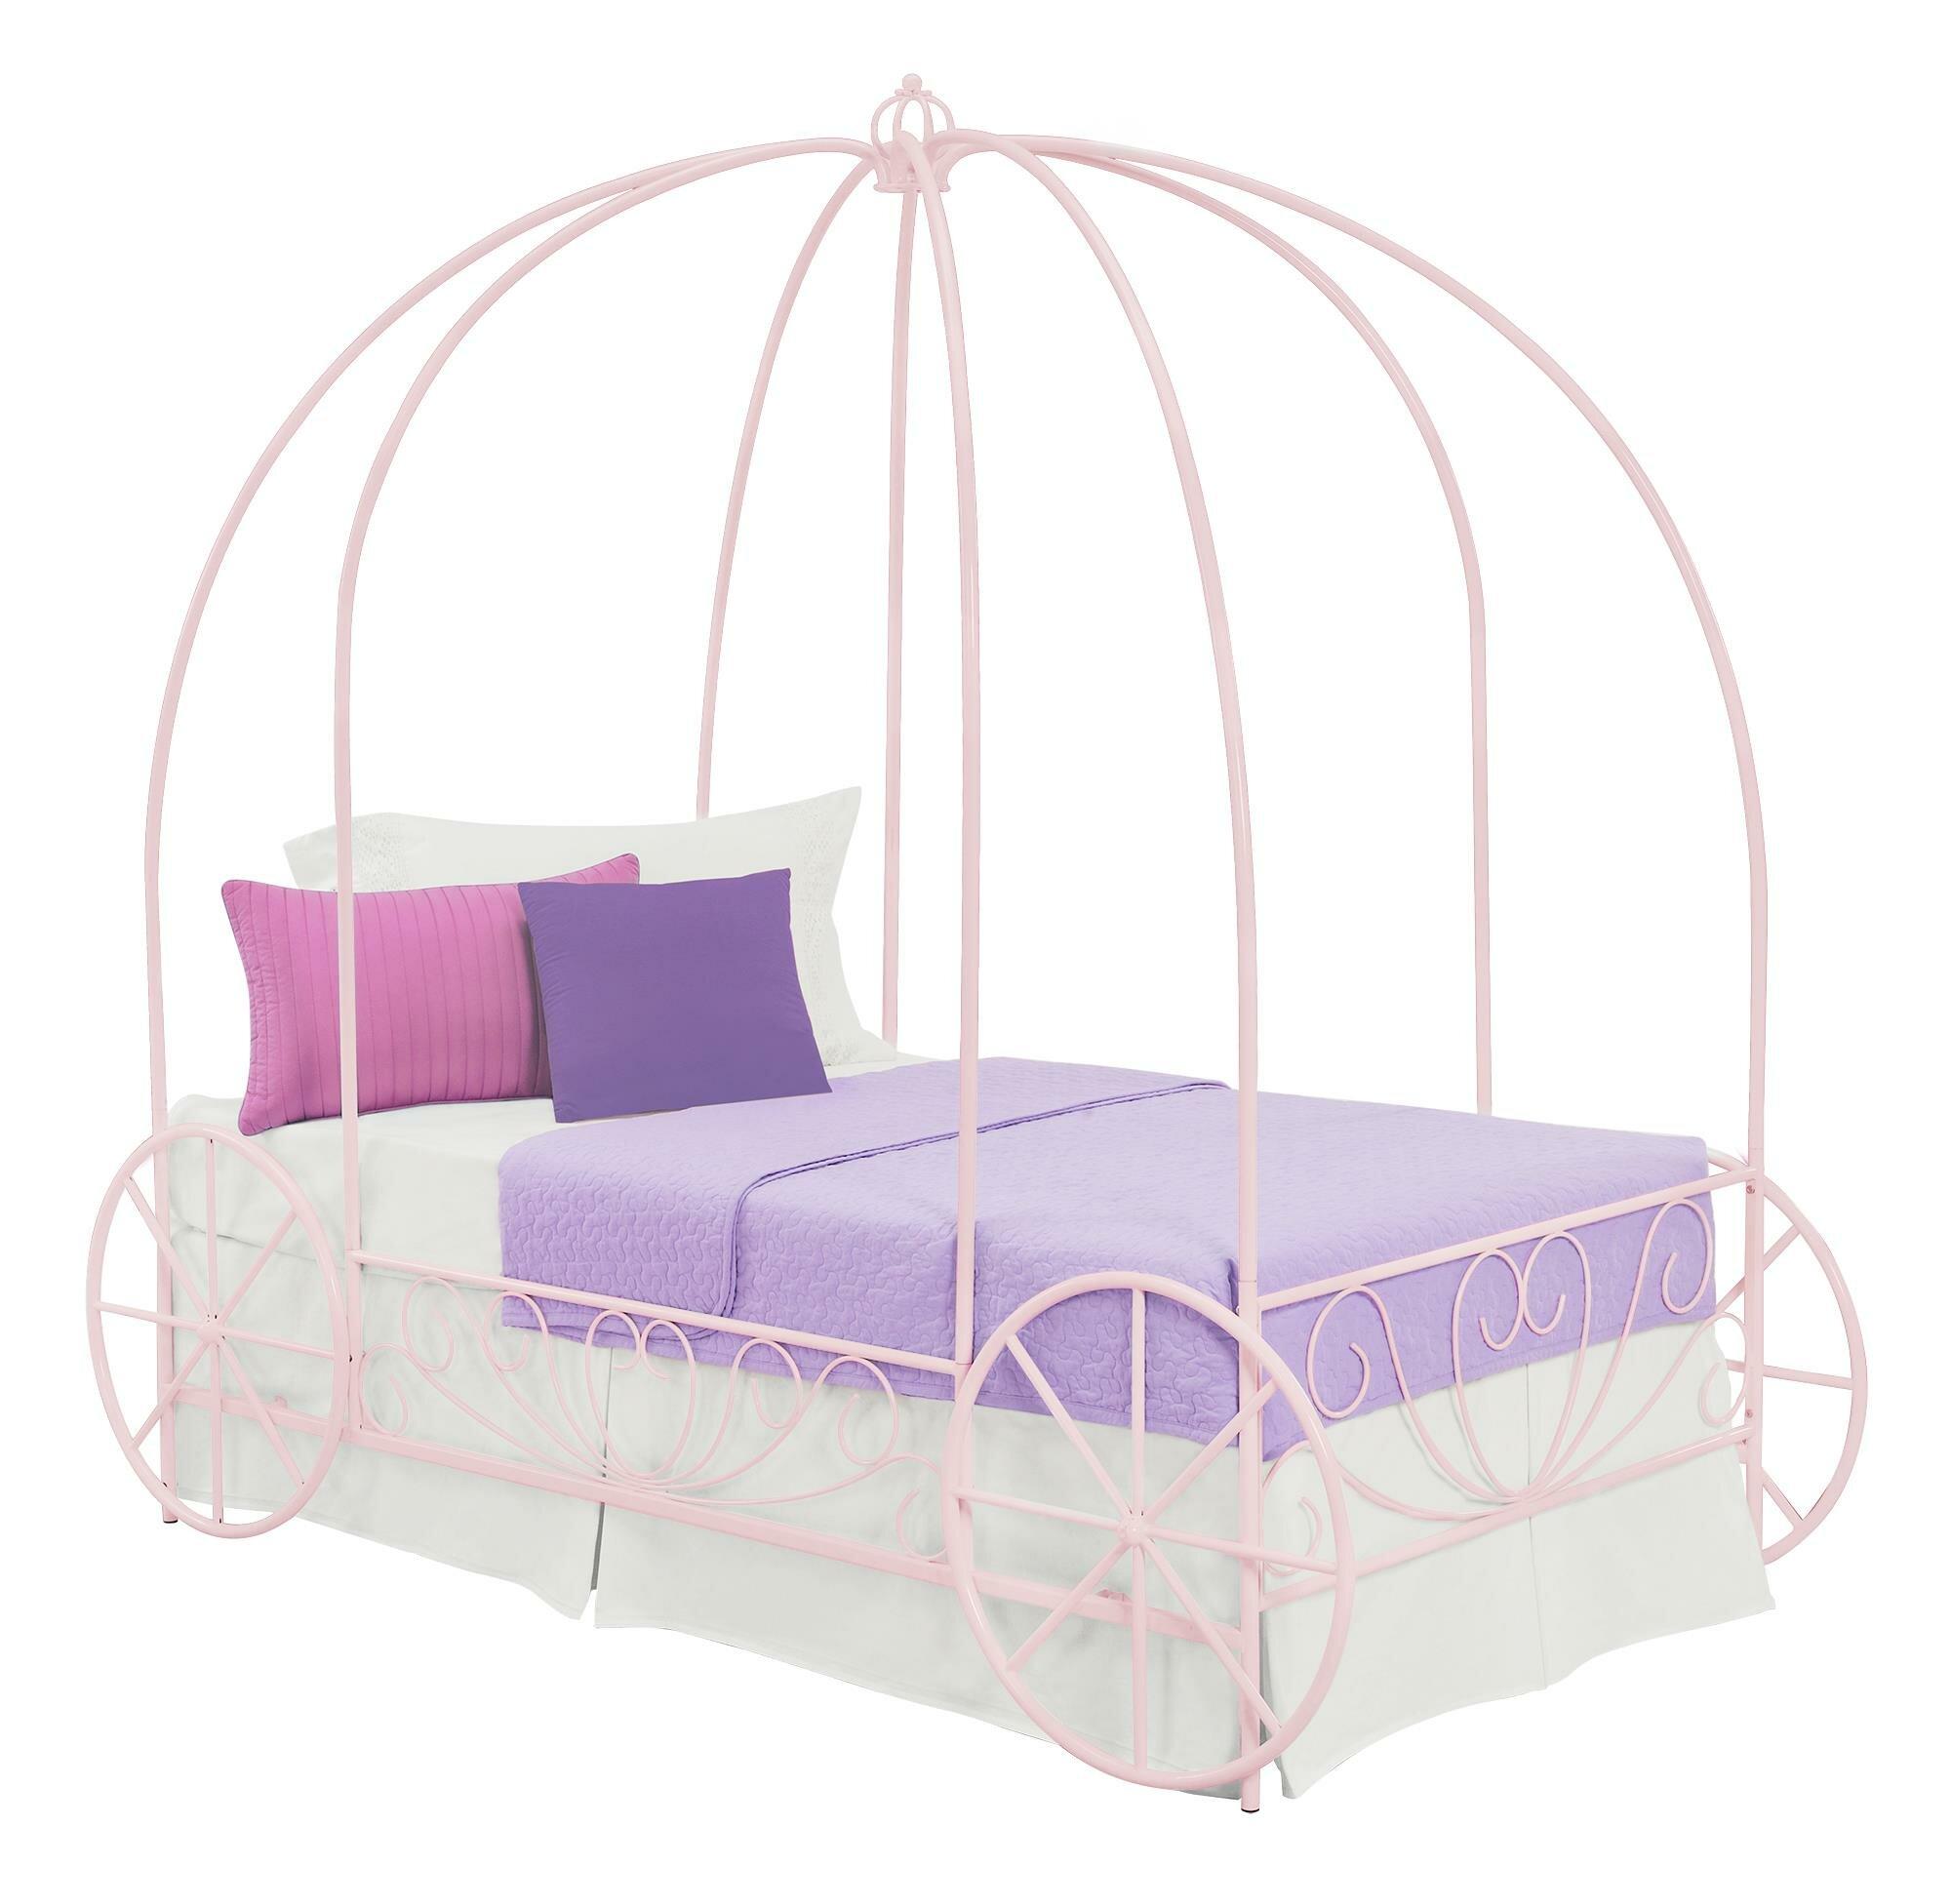 sc 1 st  Wayfair & Zoomie Kids Brandy Twin Canopy Bed u0026 Reviews | Wayfair